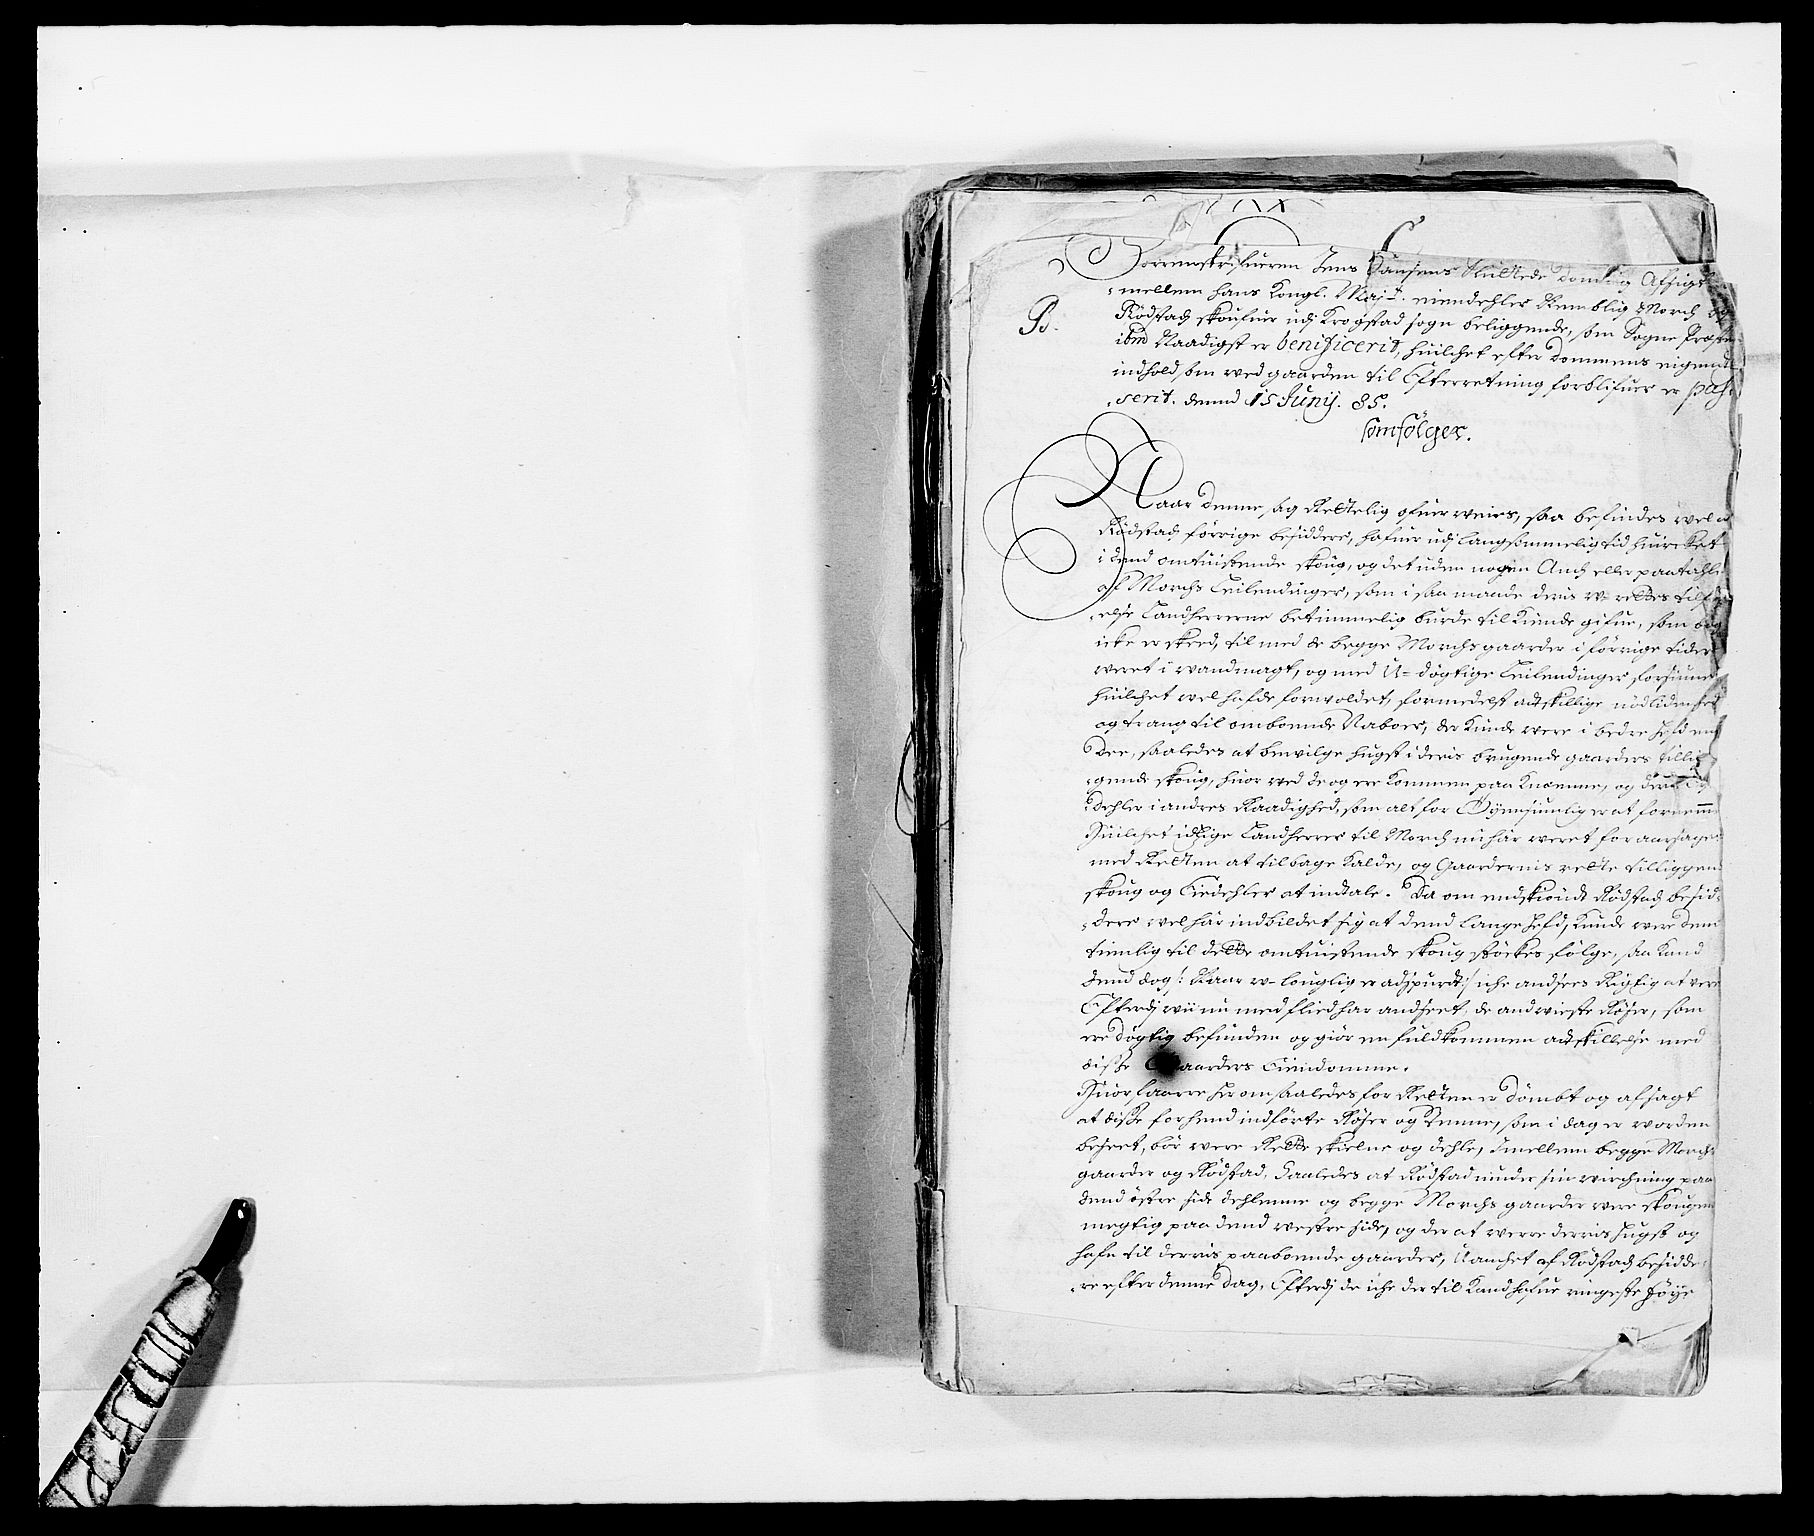 RA, Rentekammeret inntil 1814, Reviderte regnskaper, Fogderegnskap, R09/L0433: Fogderegnskap Follo, 1685-1686, s. 8